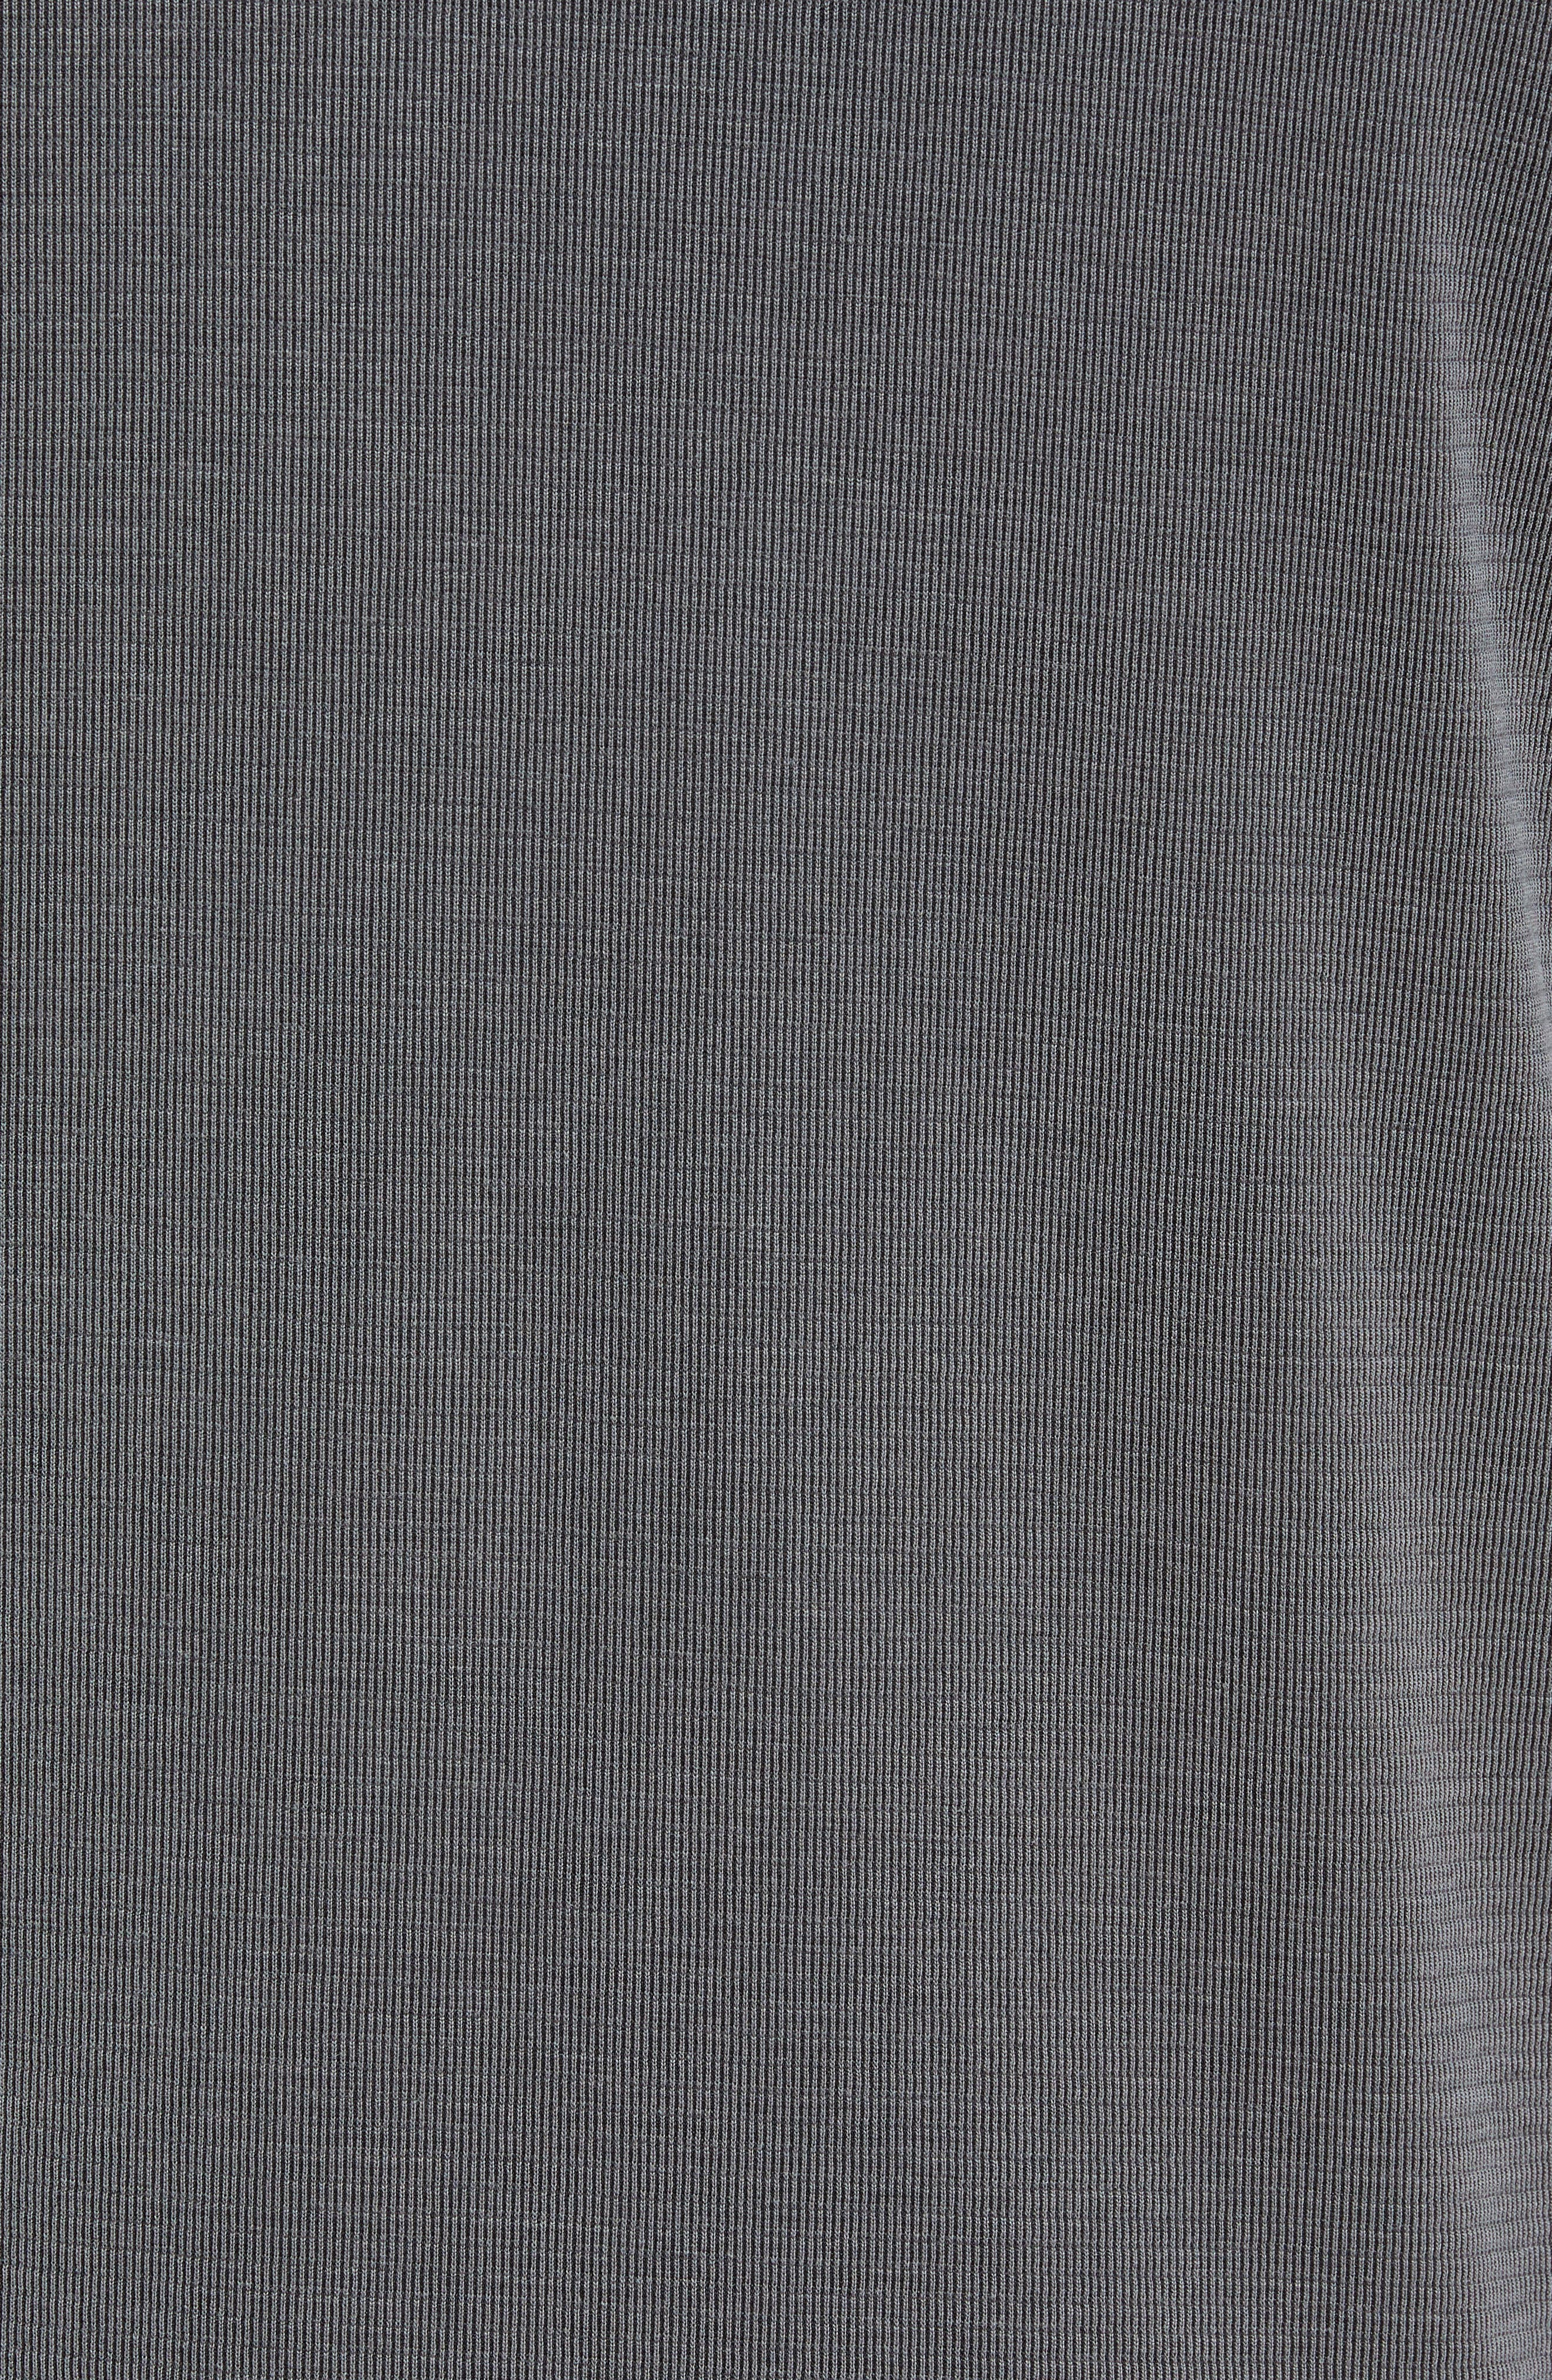 Coastal Crest Regular Fit Polo,                             Alternate thumbnail 5, color,                             BLACK